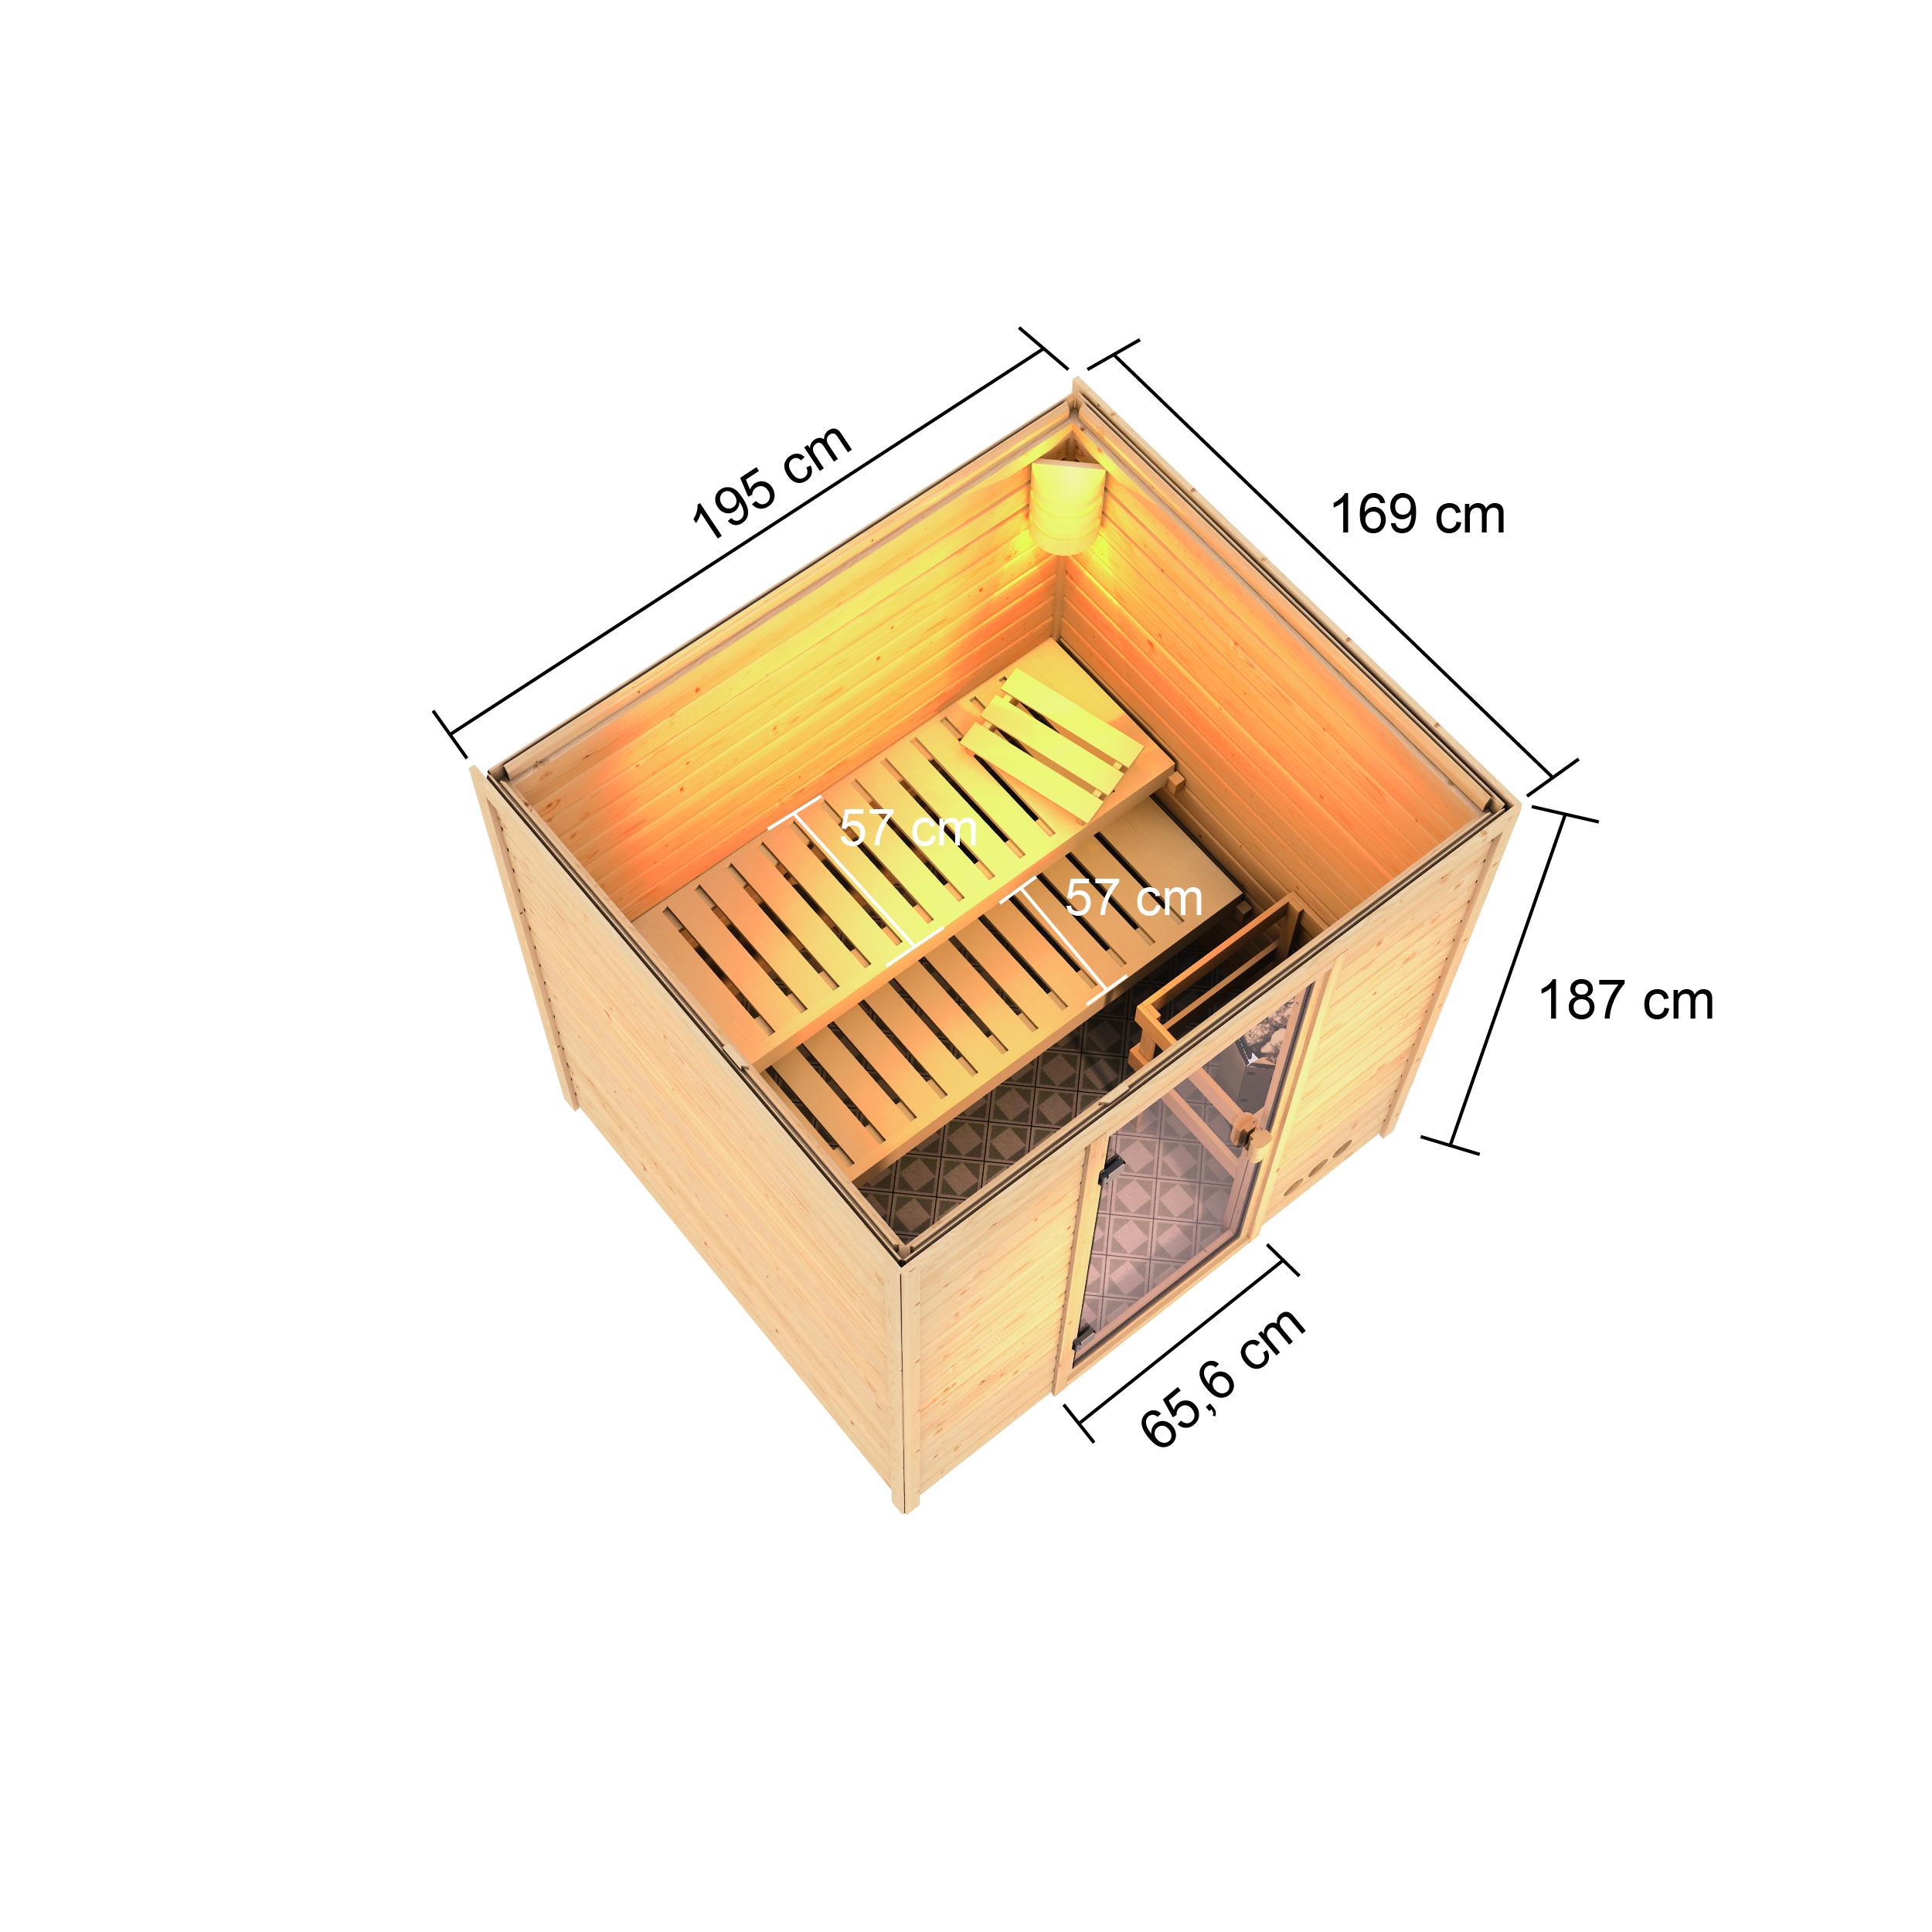 Woodfeeling Sauna Adelina 38mm Bio Saunaofen 9kW extern Bild 6